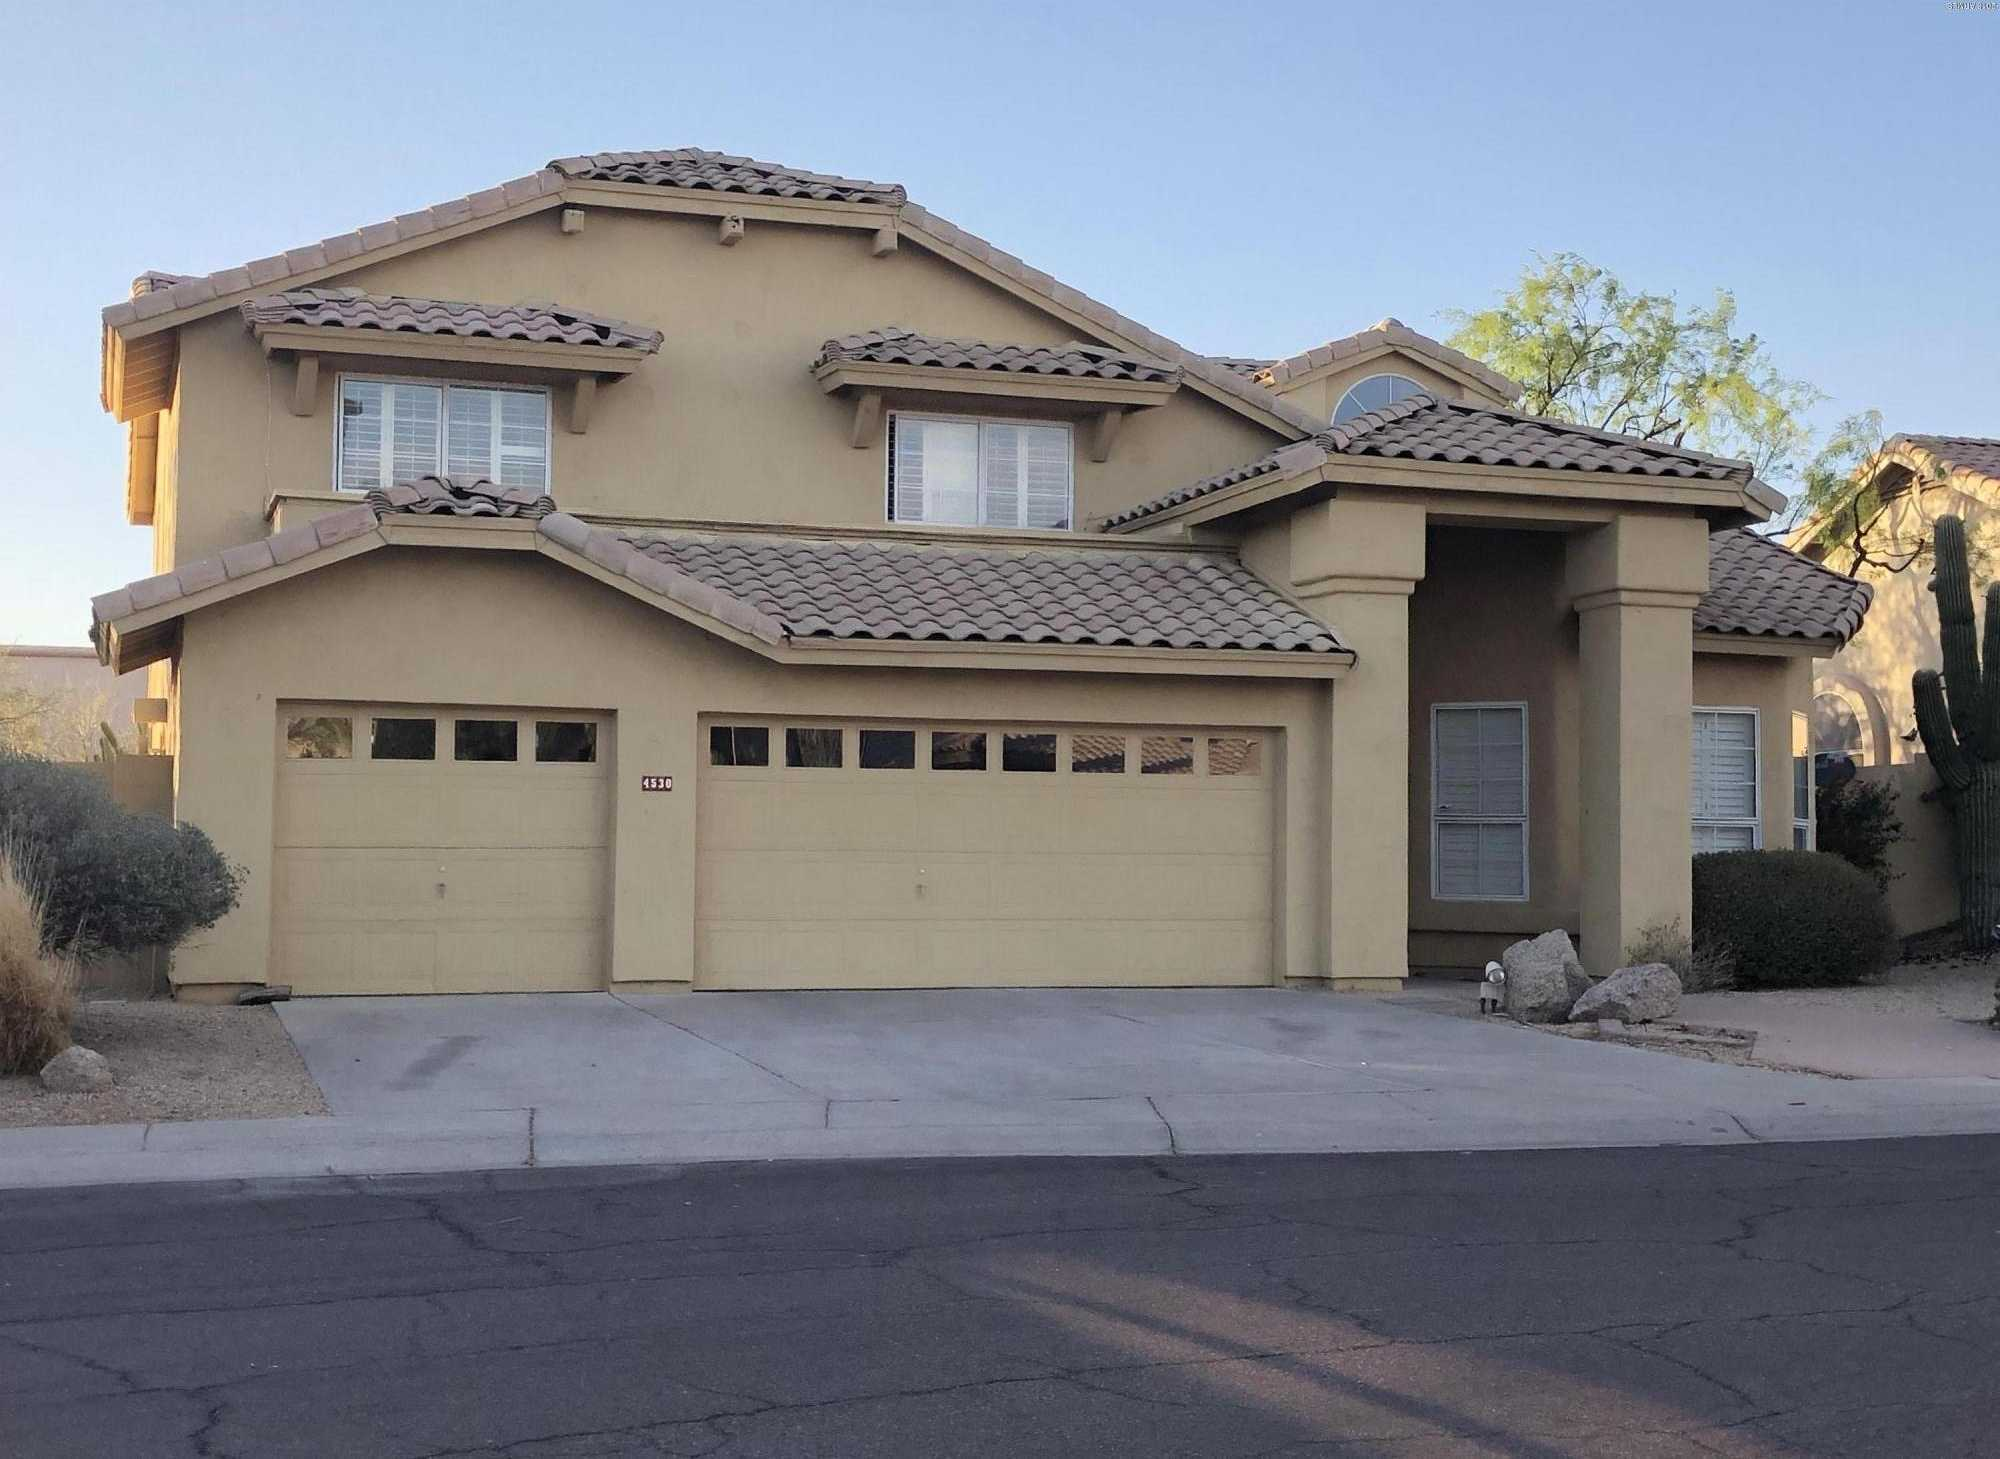 $498,000 - 4Br/3Ba - Home for Sale in Desert Fairways At Tatum Ranch, Cave Creek